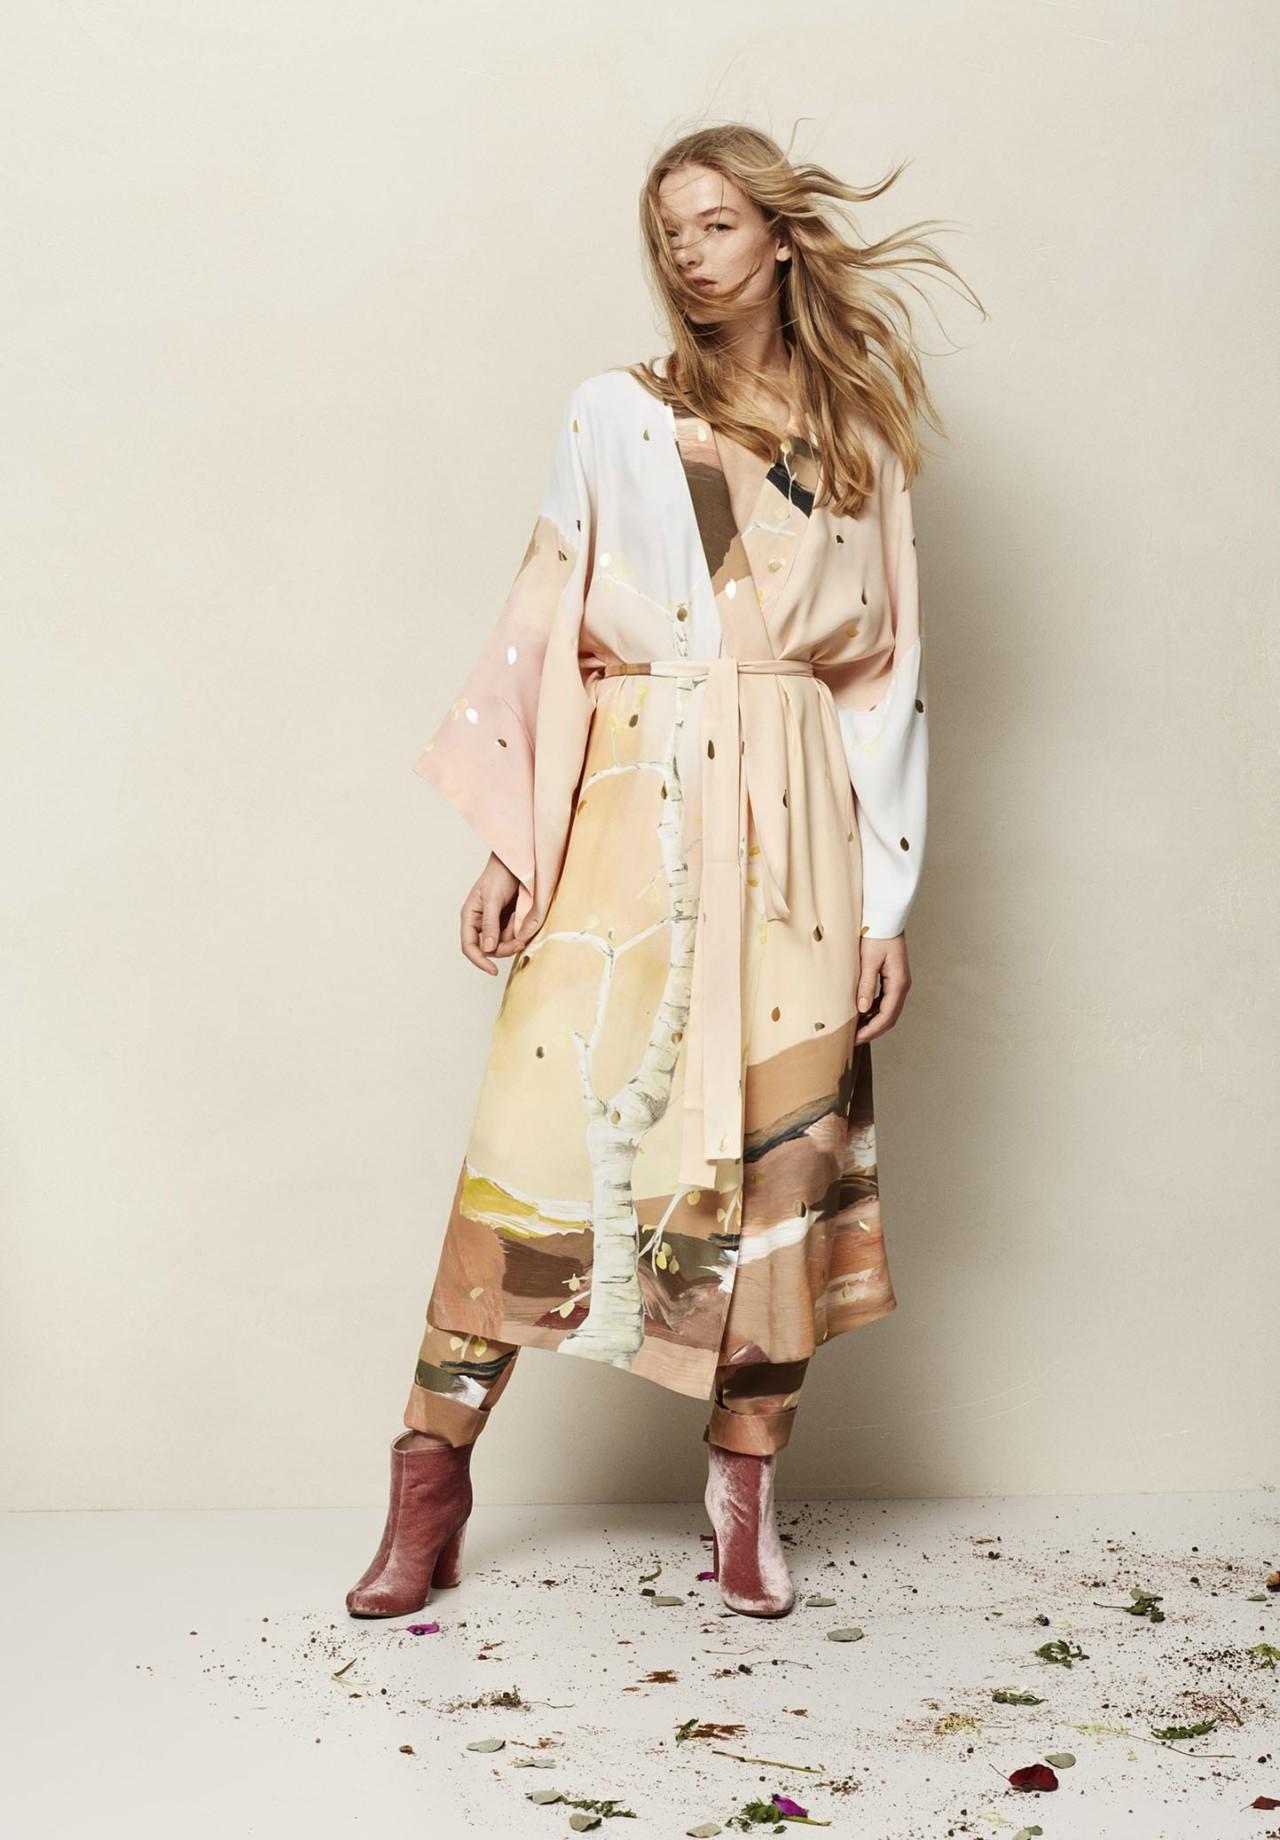 Molly Kyhl stine goya aw17 campaign